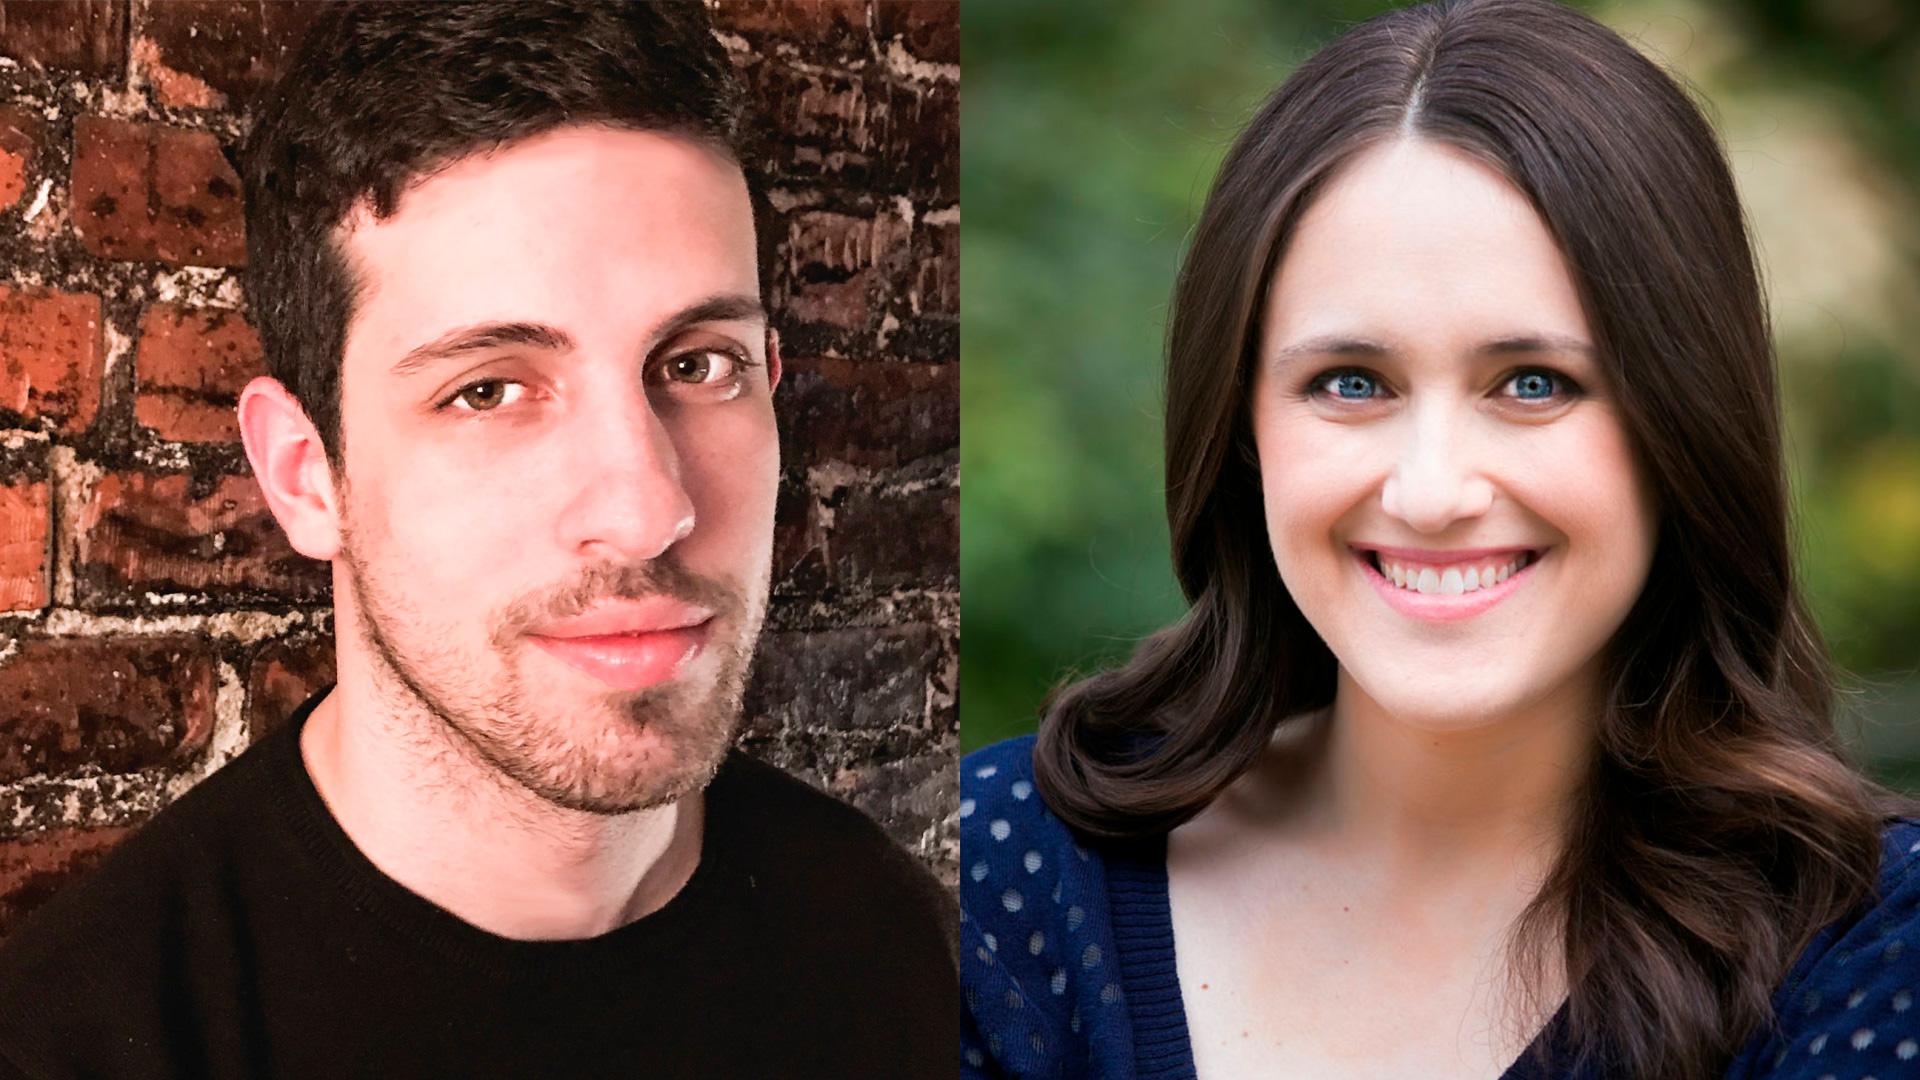 Becky Albertalli og Adam Silvera udgiver fælles YA-roman på CarlsenPuls